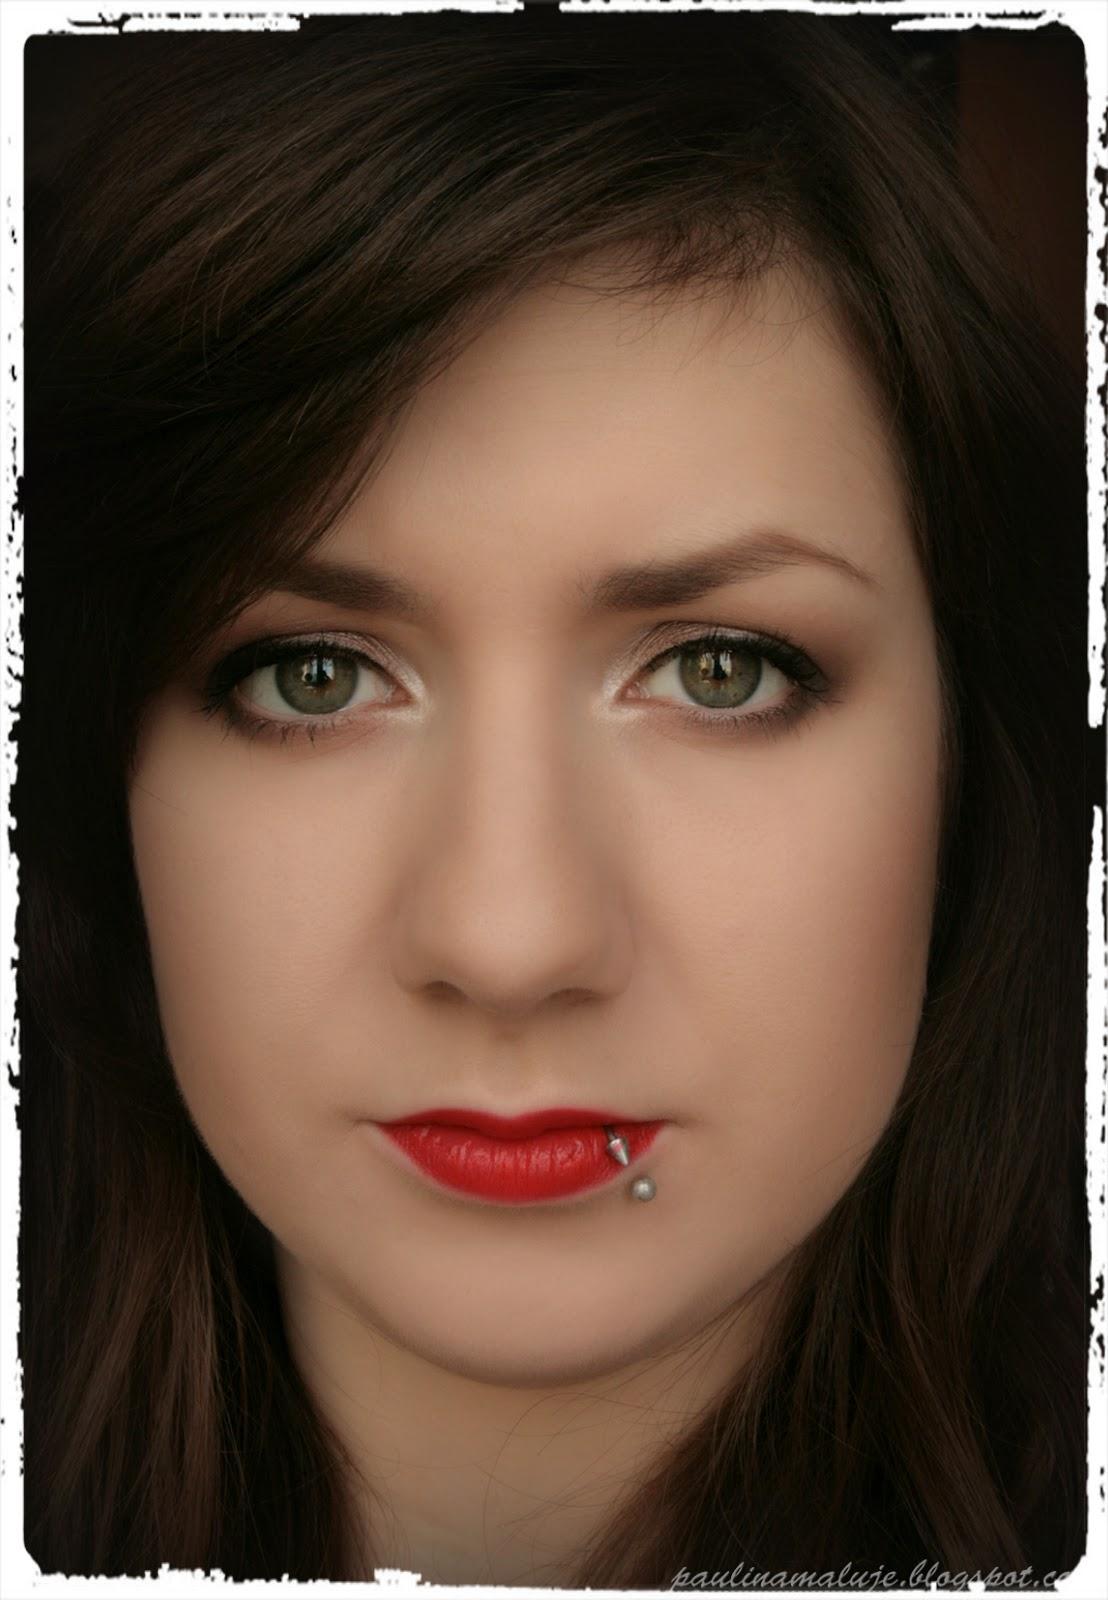 classy make-up